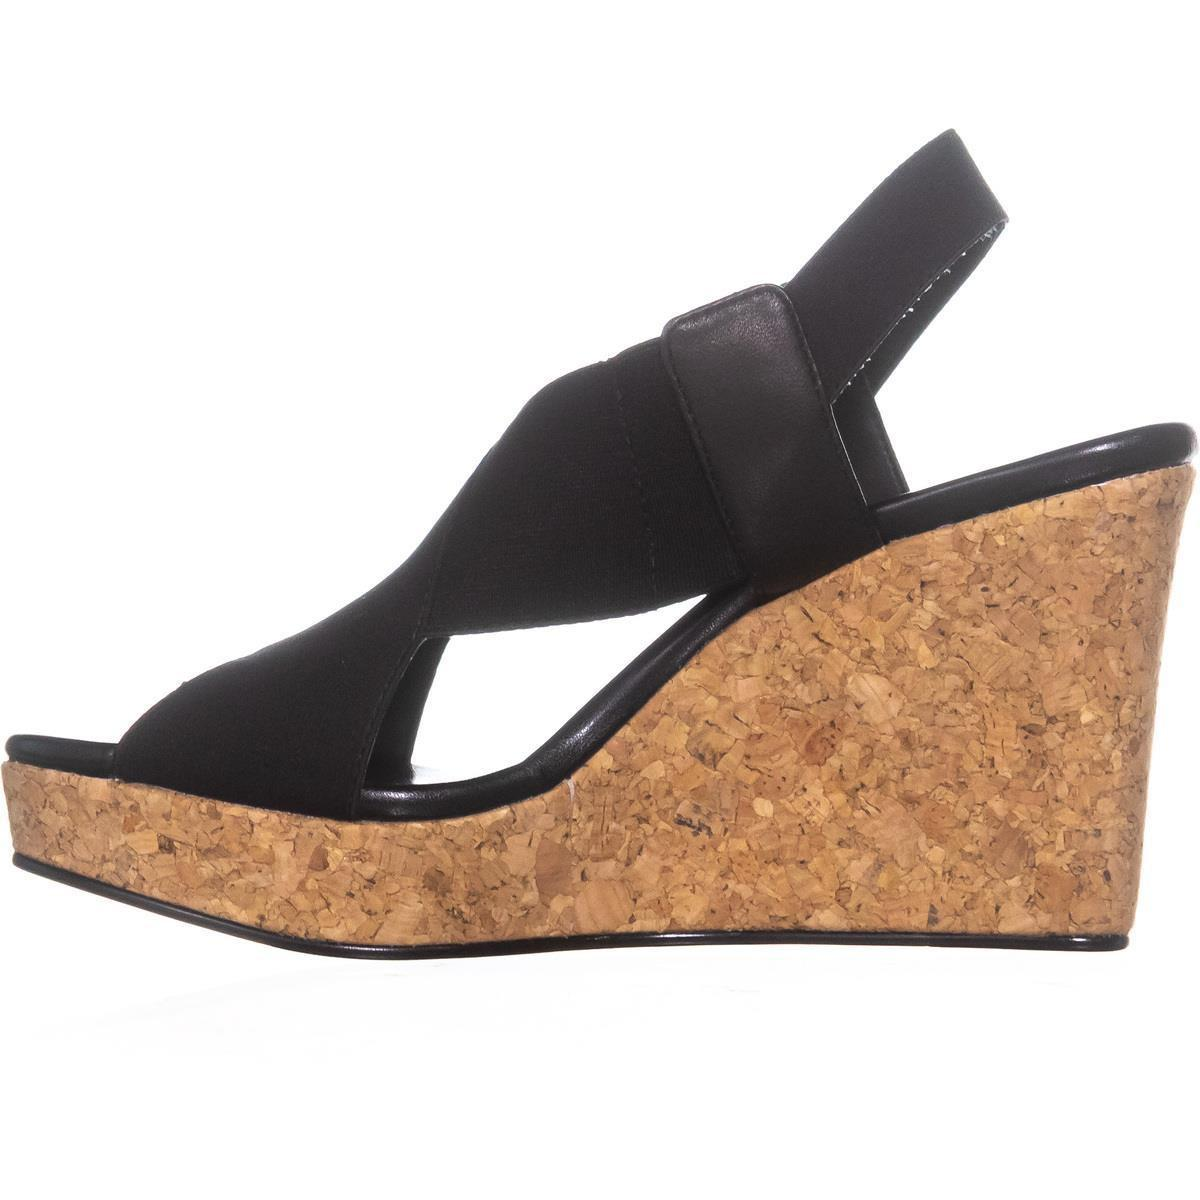 61df422e5eb Lyst - DKNY Jamara Criss Cross Wedge Sandals in Black